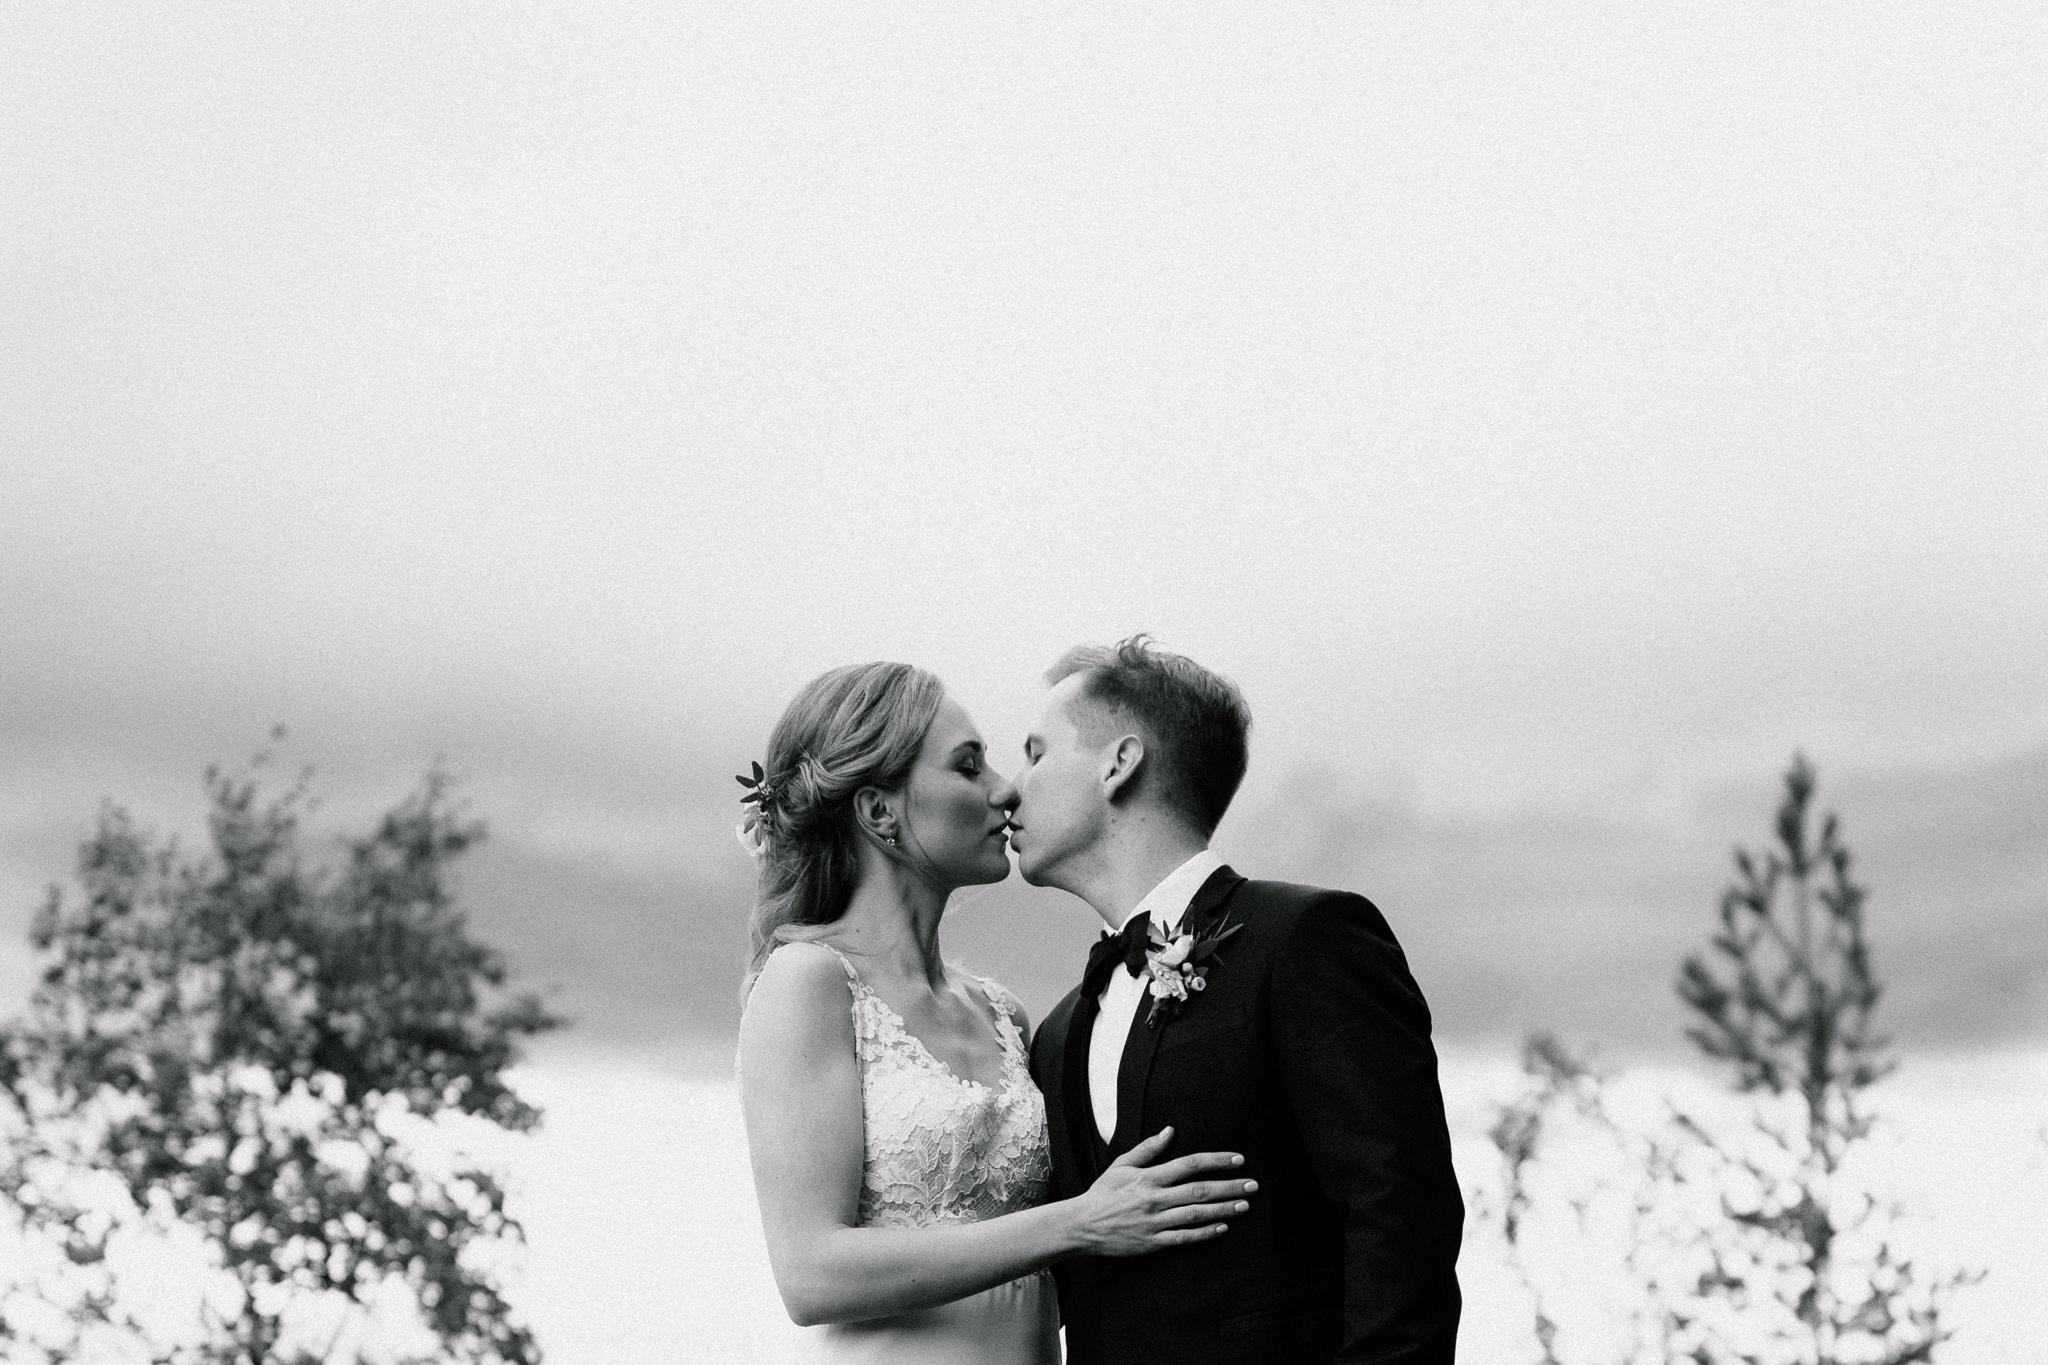 Johanna + Mikko - Tampere - Photo by Patrick Karkkolainen Wedding Photographer-136.jpg